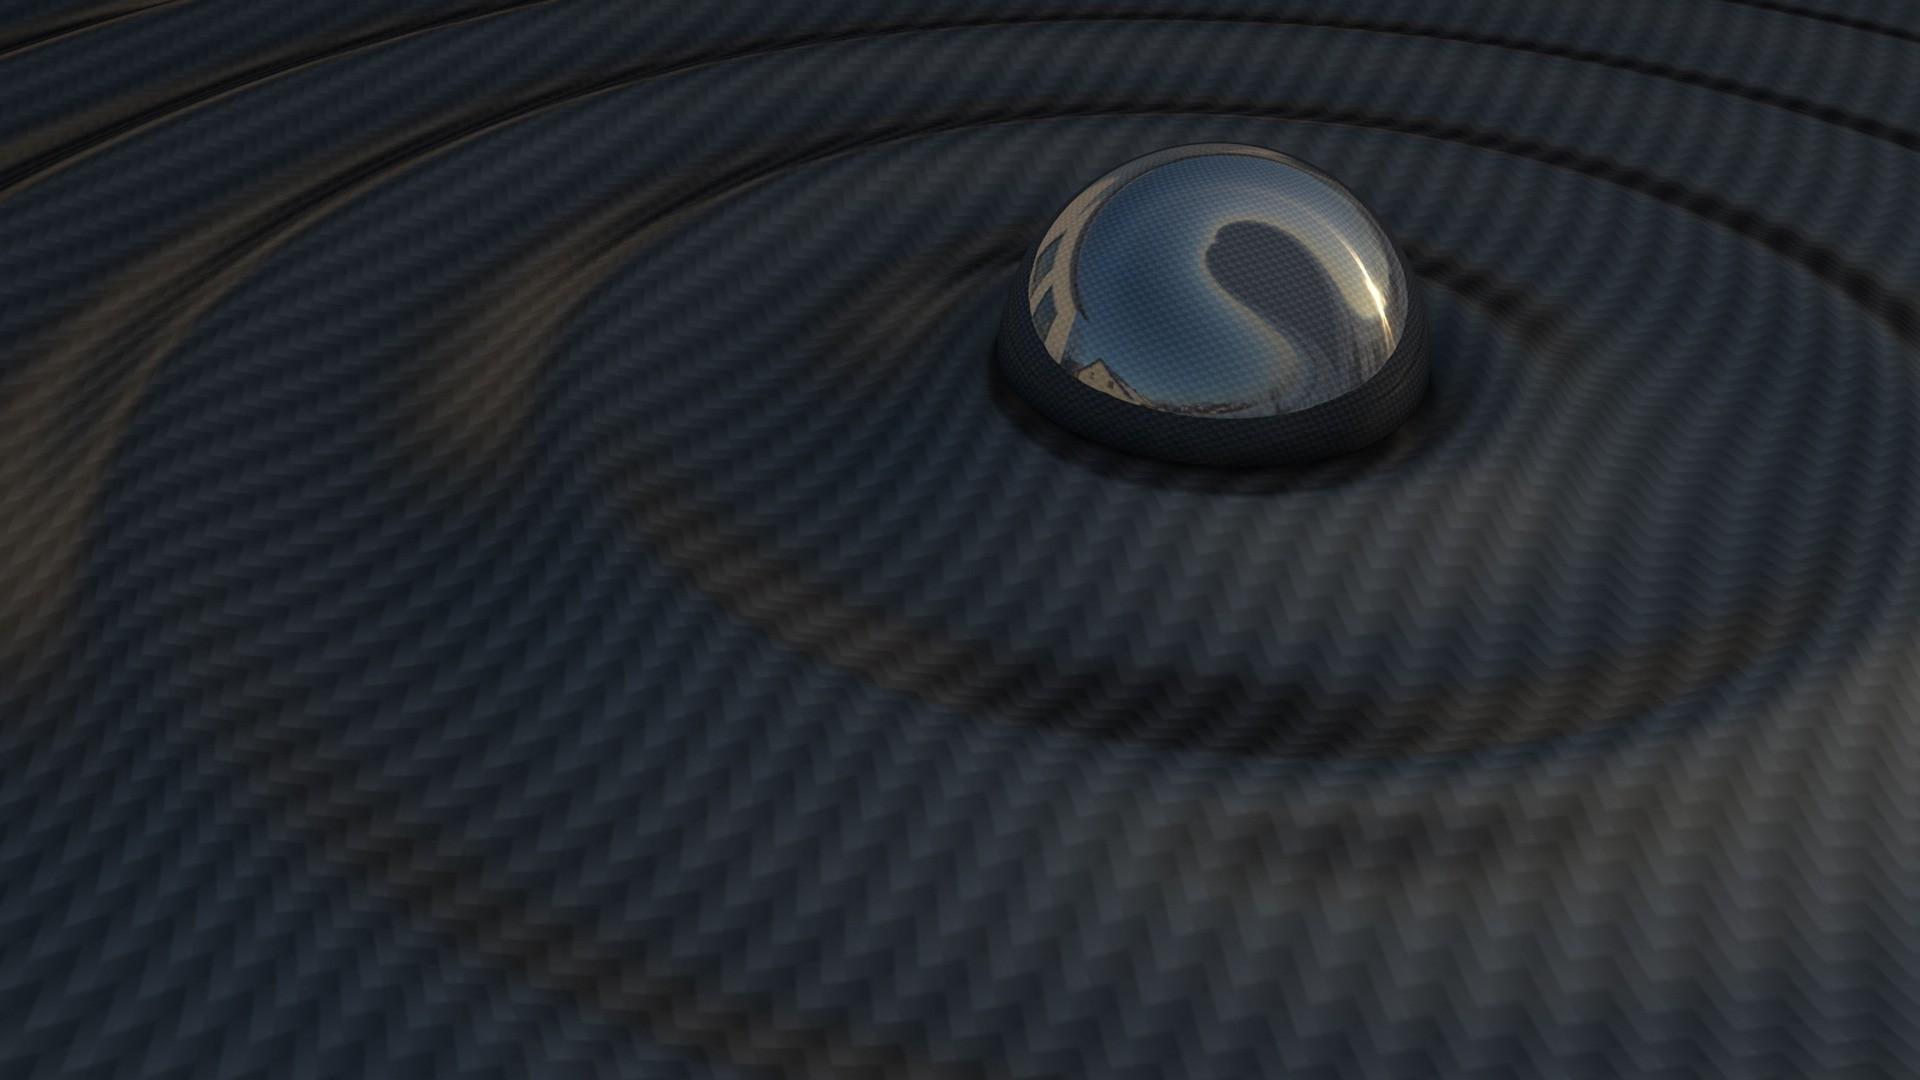 Lowrider Wallpaper Iphone Wallpaper Abstract Sky Blue Circle Carbon Fiber